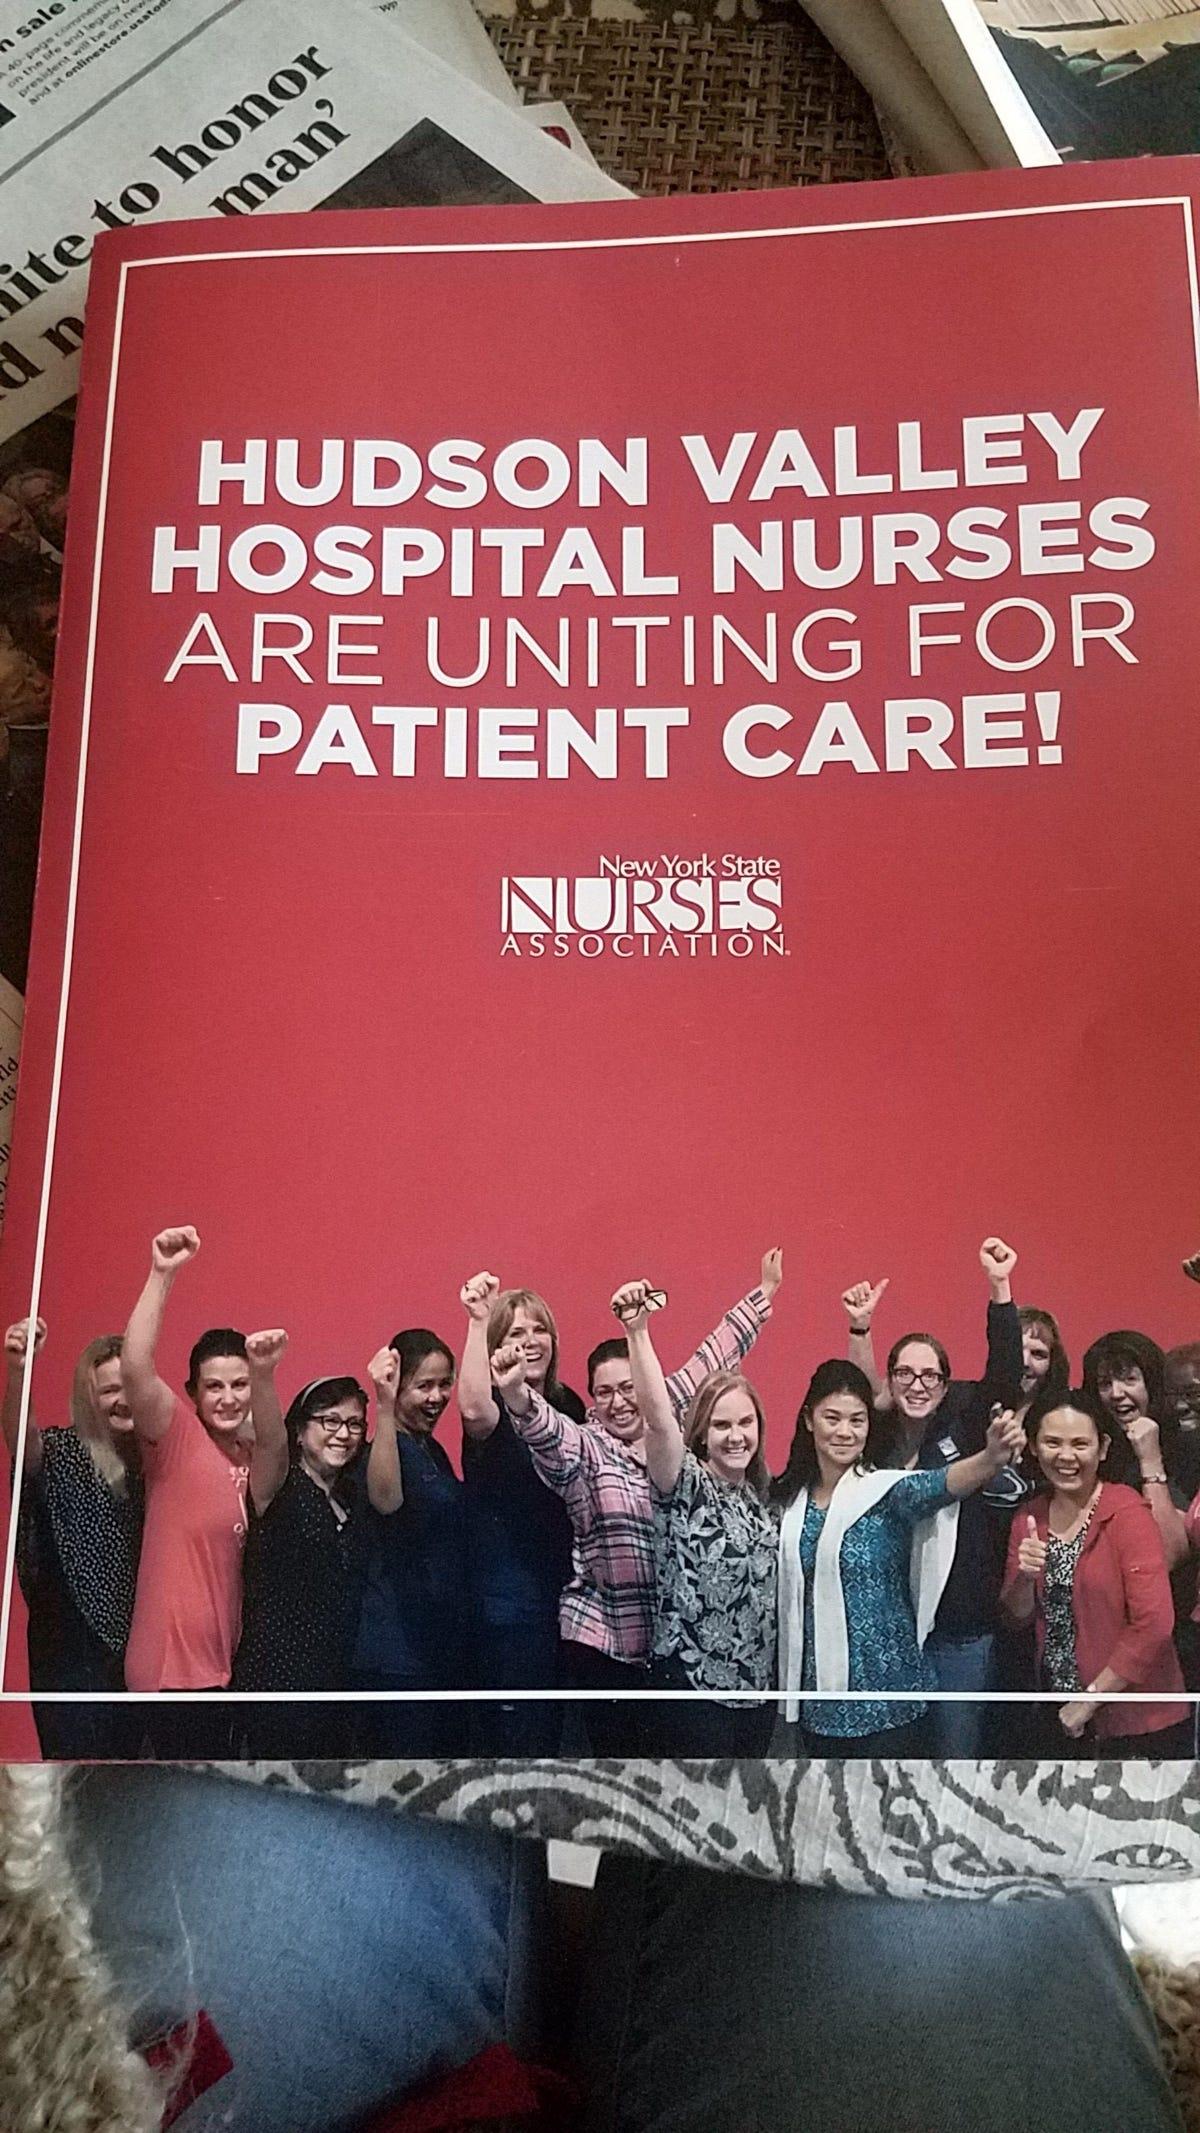 Results of NewYork-Presbyterian Hudson Valley Hospital union vote